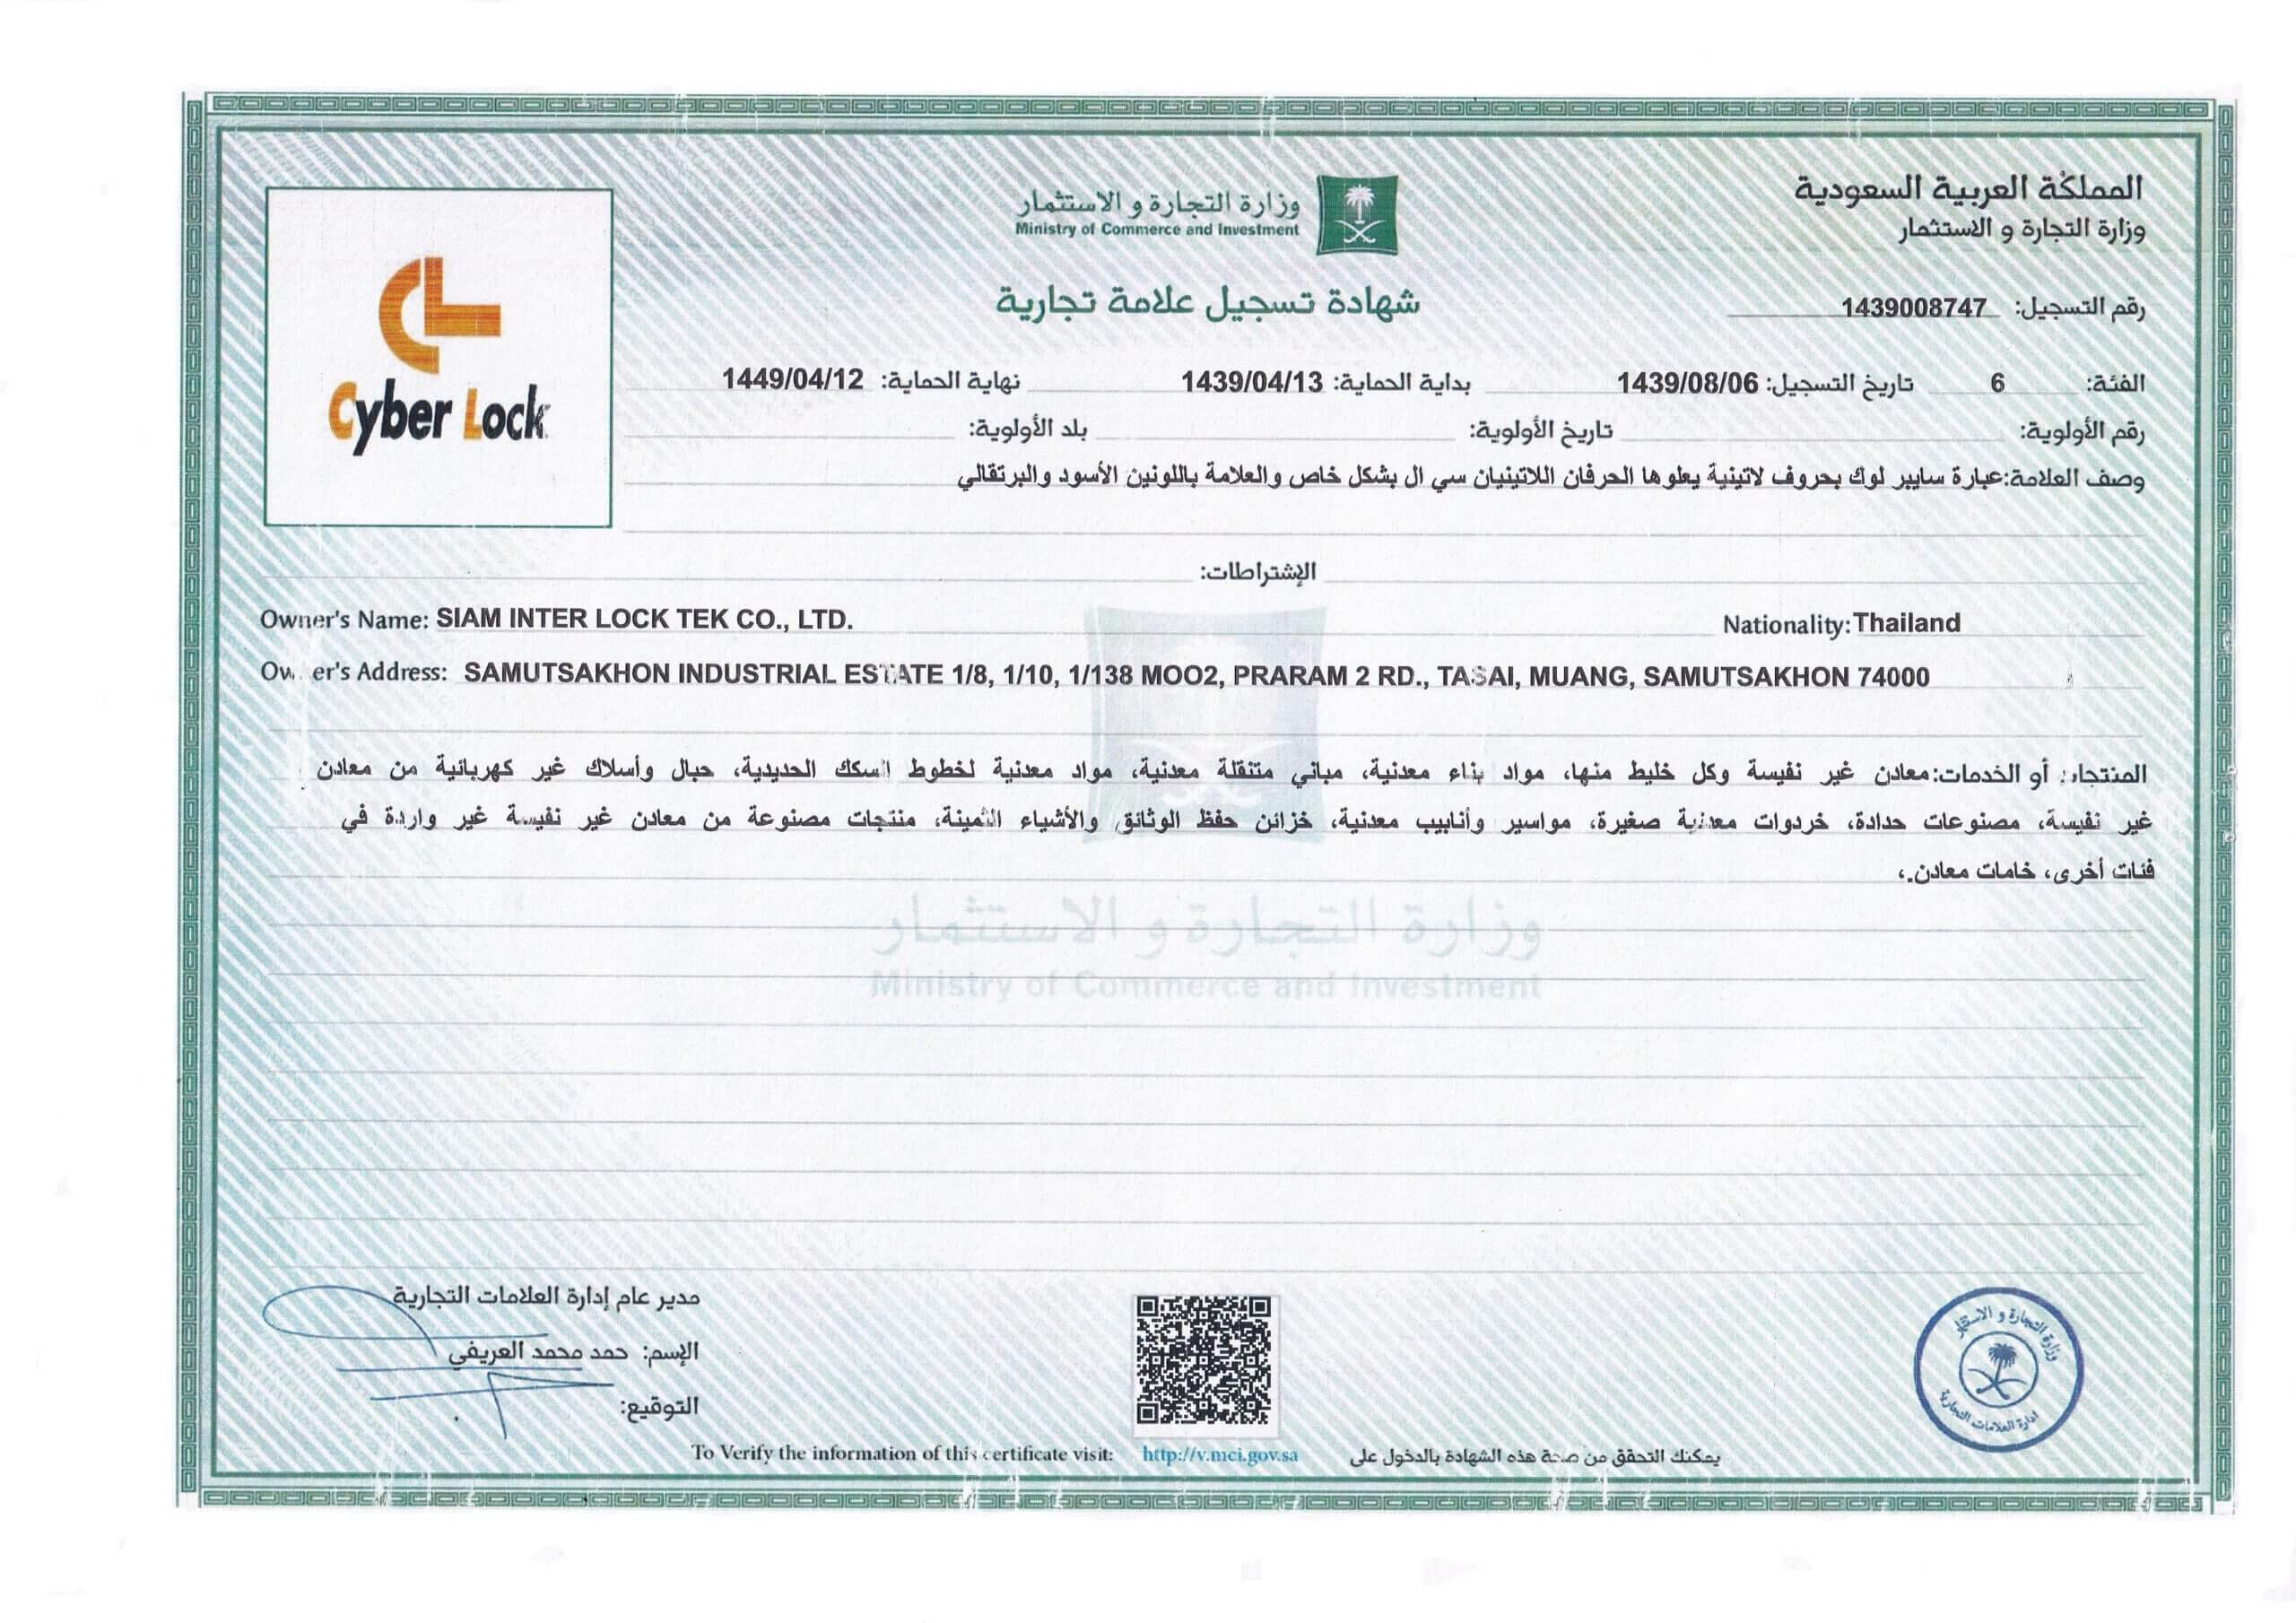 Cyber lock_Saudi Arabia